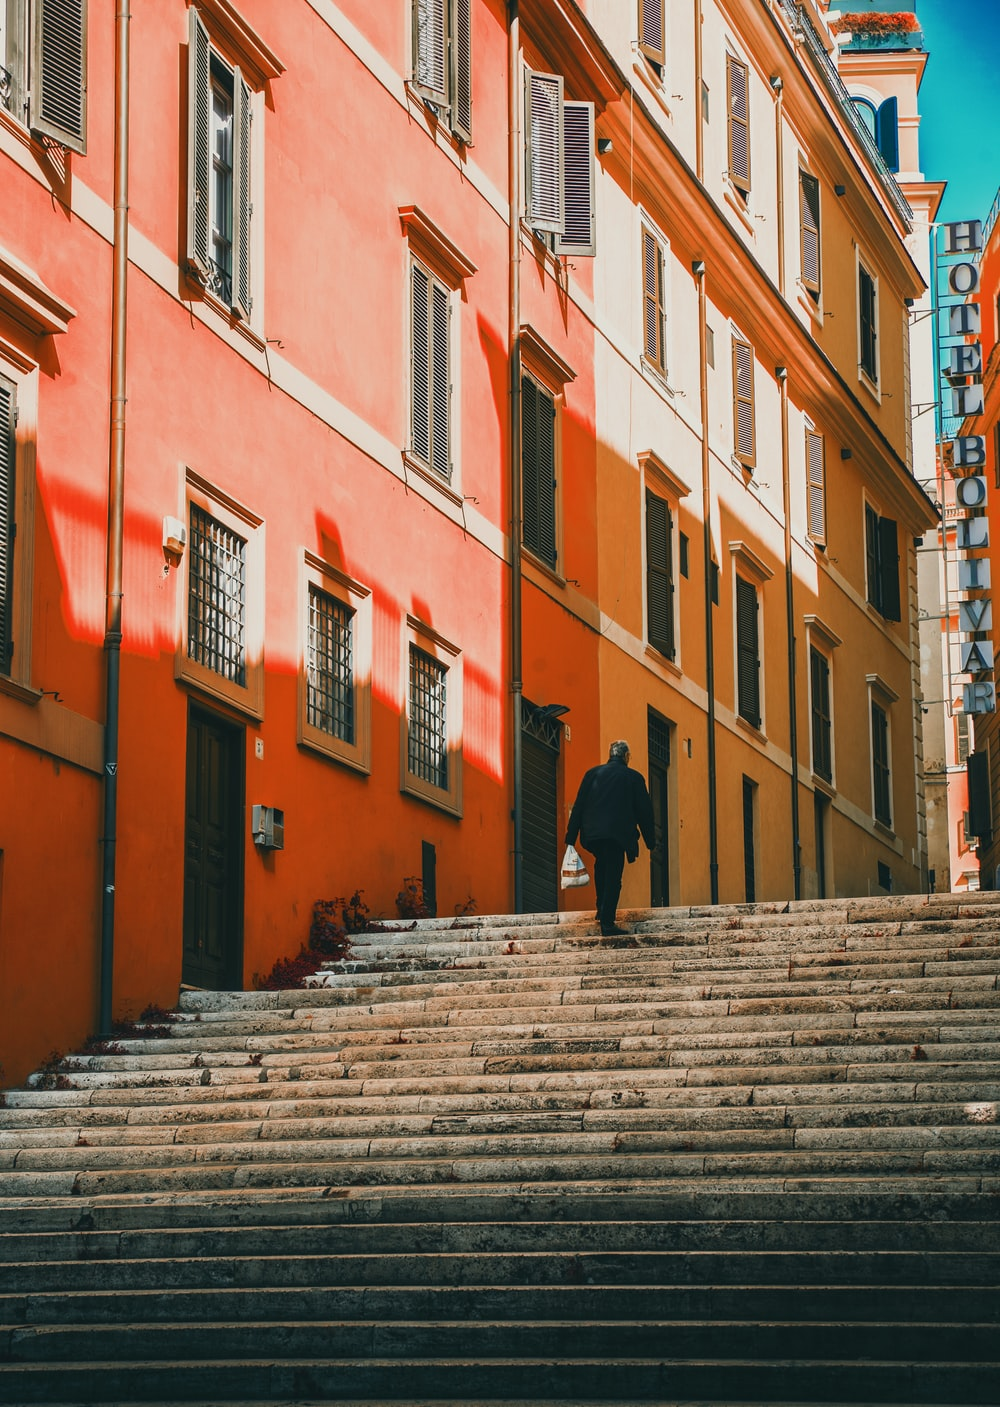 man walking on stairs beside building